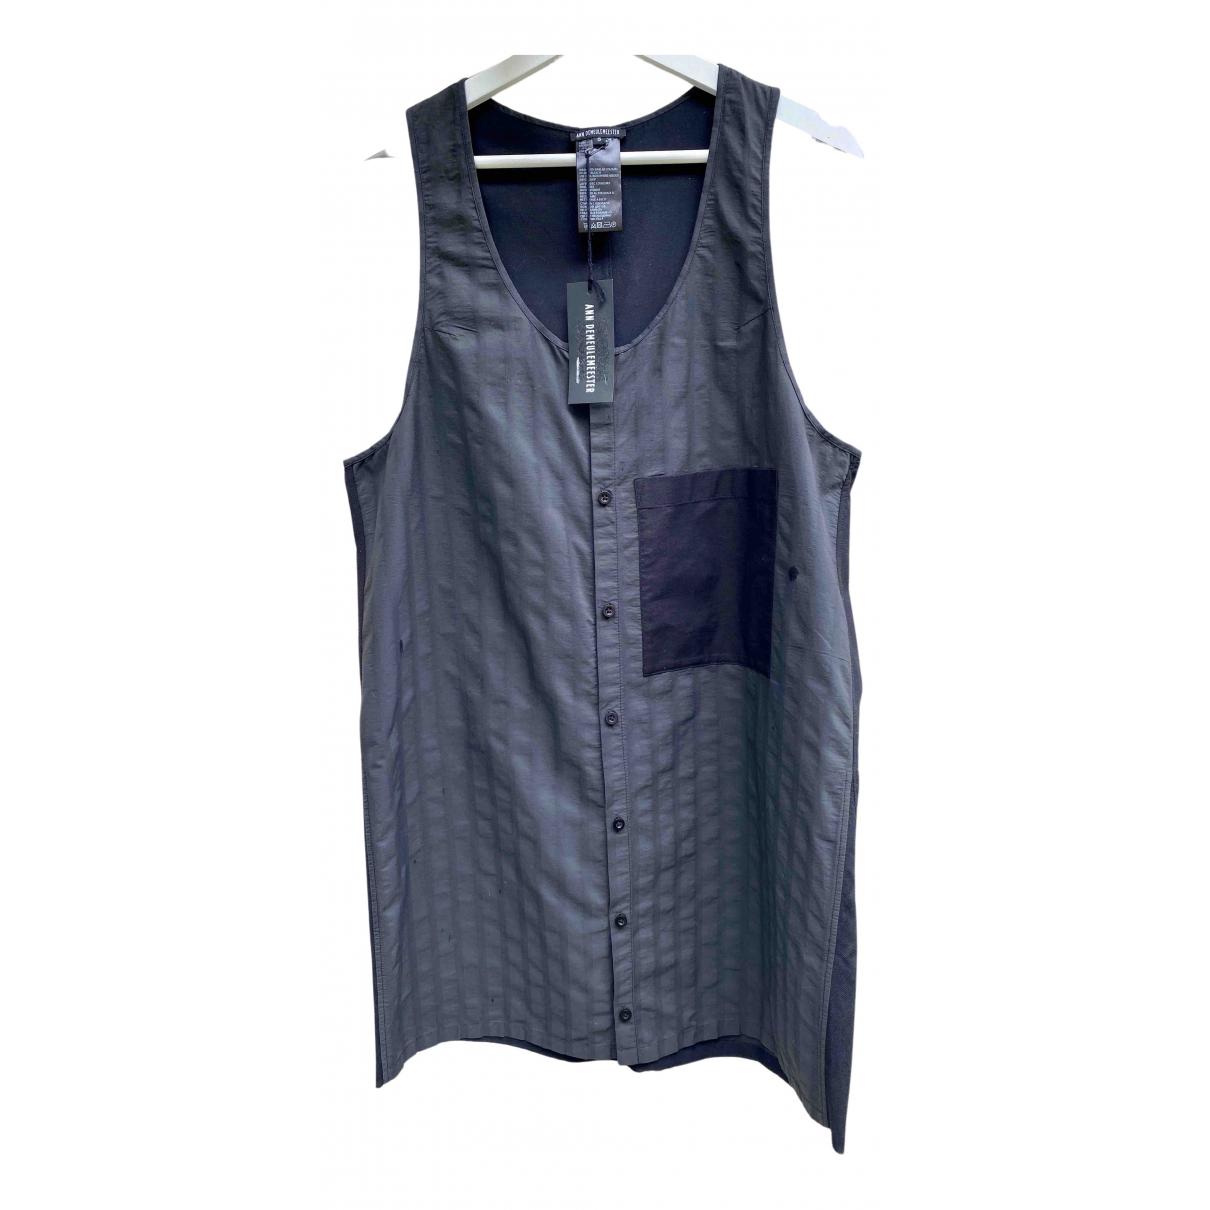 Ann Demeulemeester \N Hemden in  Schwarz Baumwolle